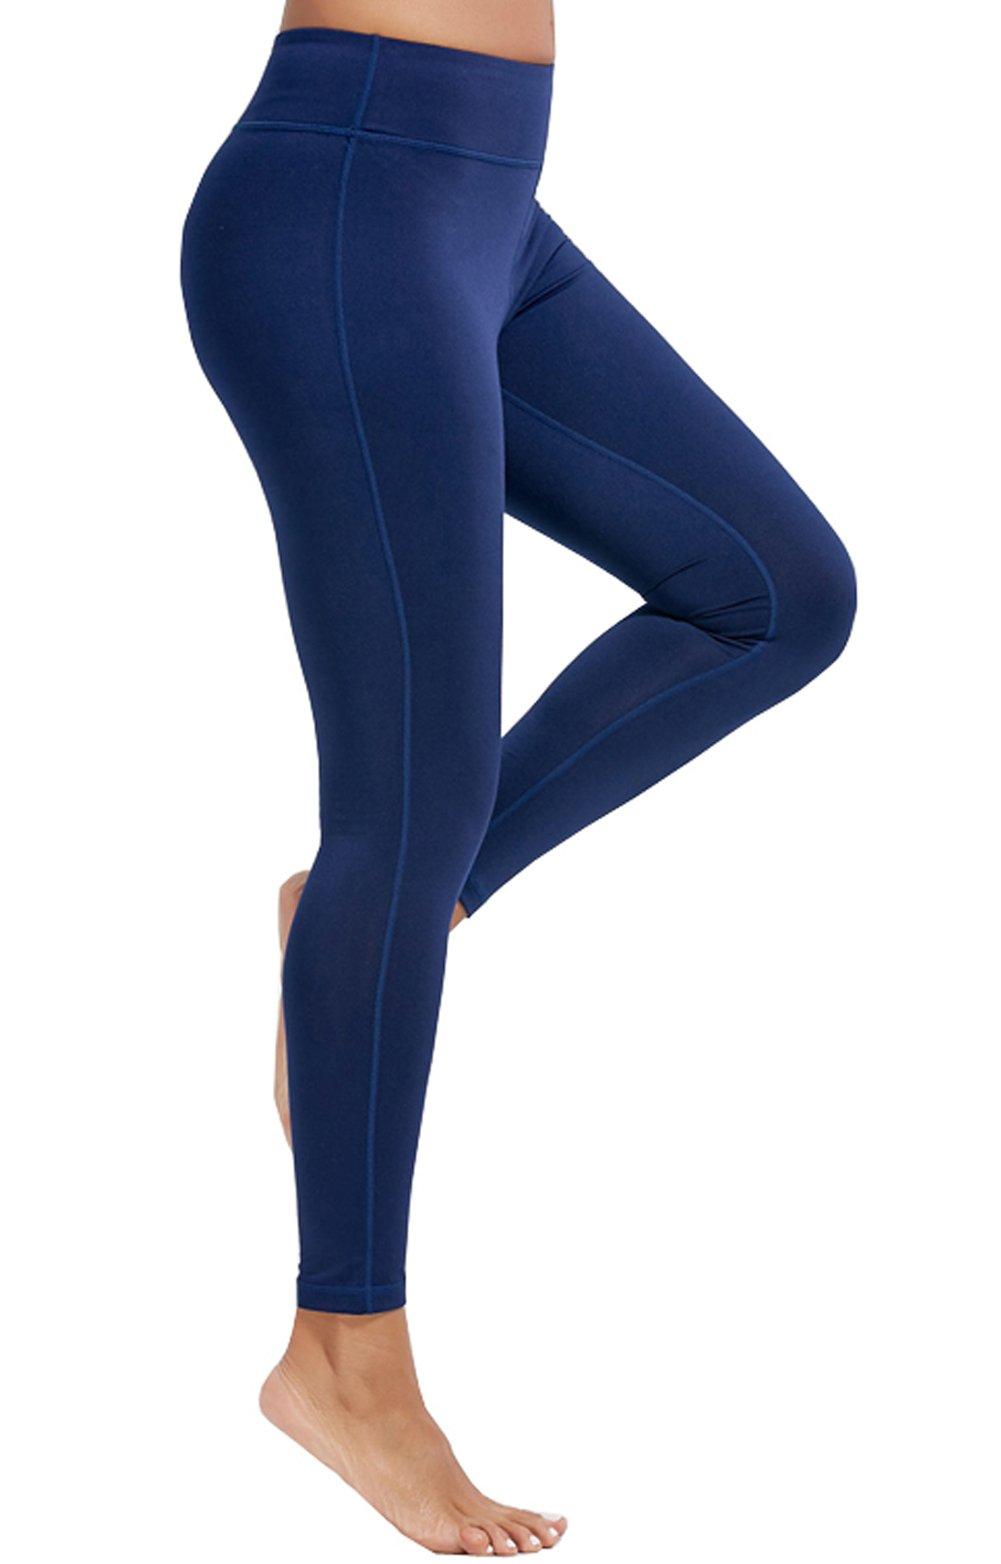 5423a3812a97a Olacia Womens High Waisted Workout Leggings Running Pants Tummy ...